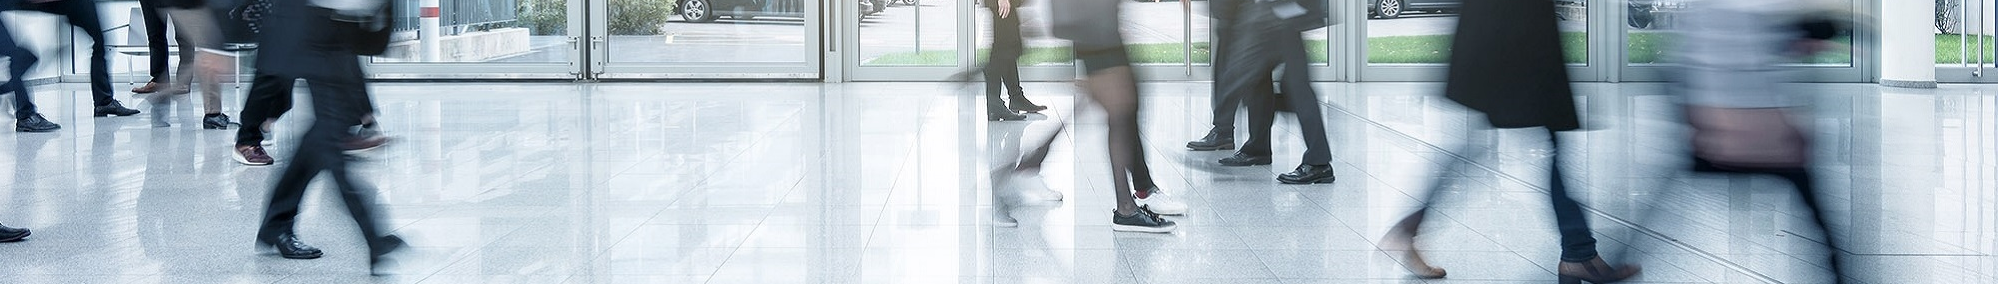 People walking through building foyer